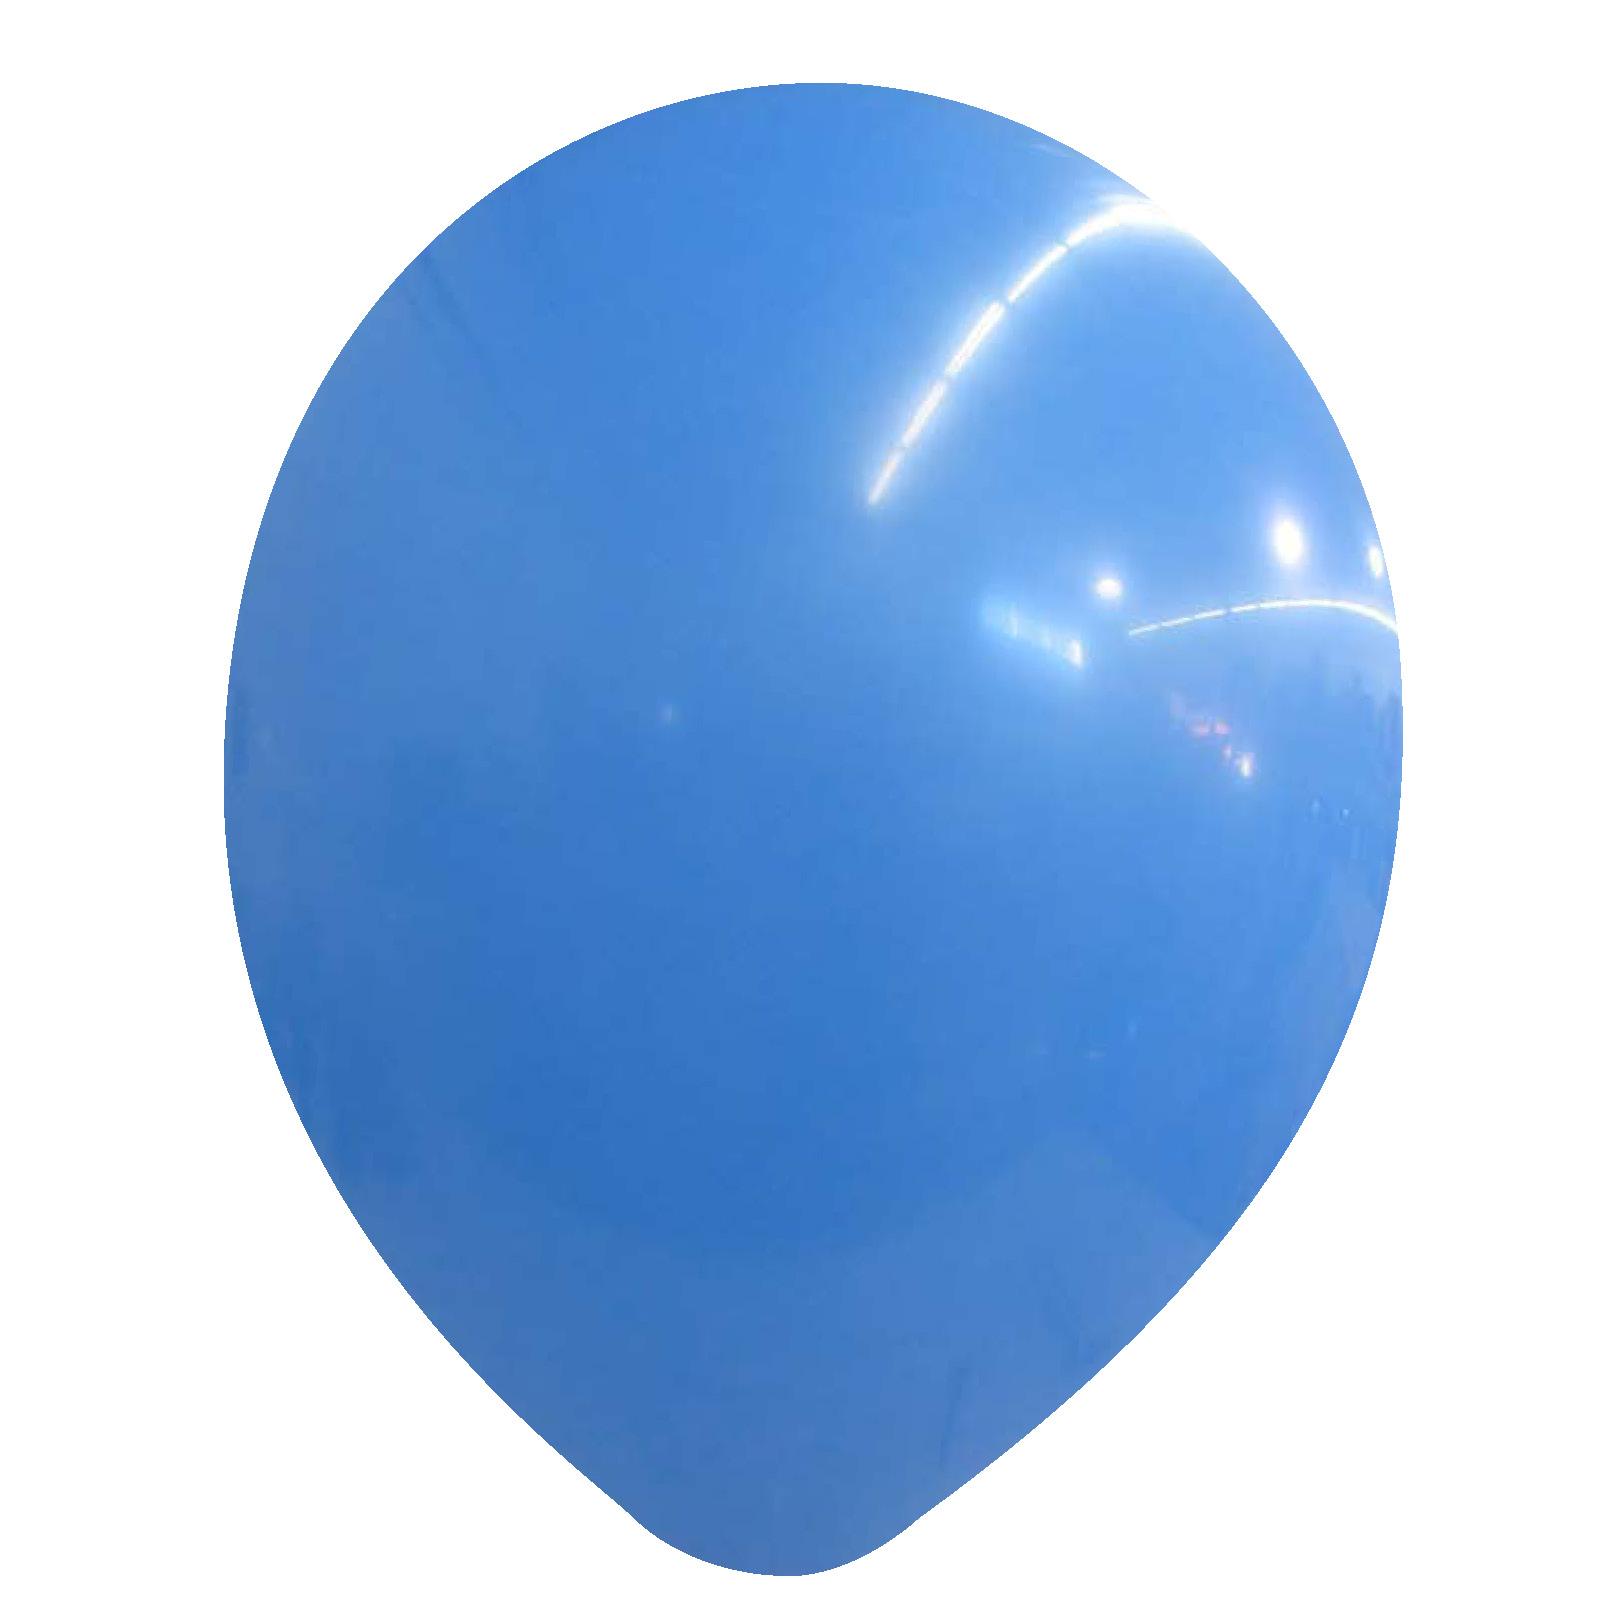 Balloonstomorrow Announces New Custom Balloons Colors